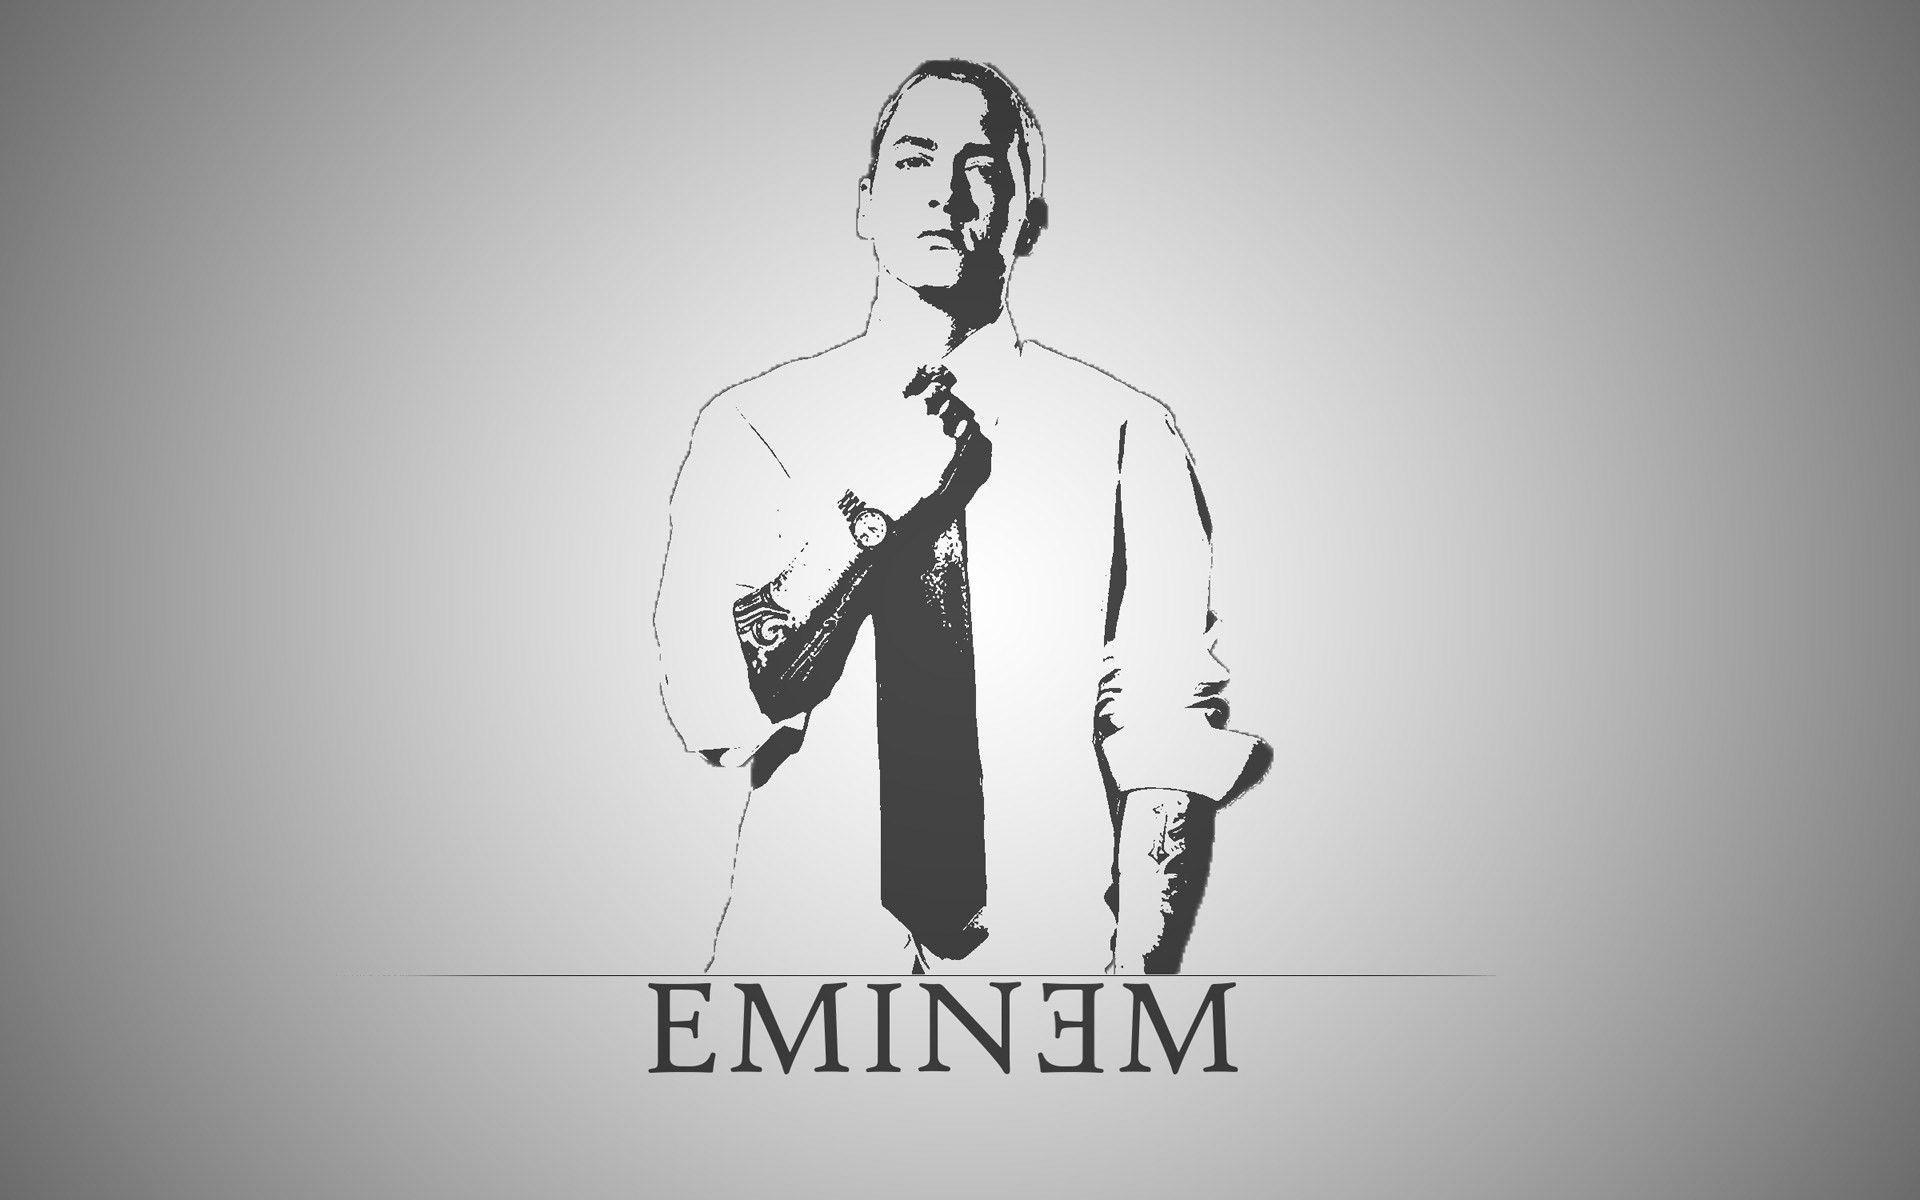 Eminem HD Wallpapers – Wallpaper Cave